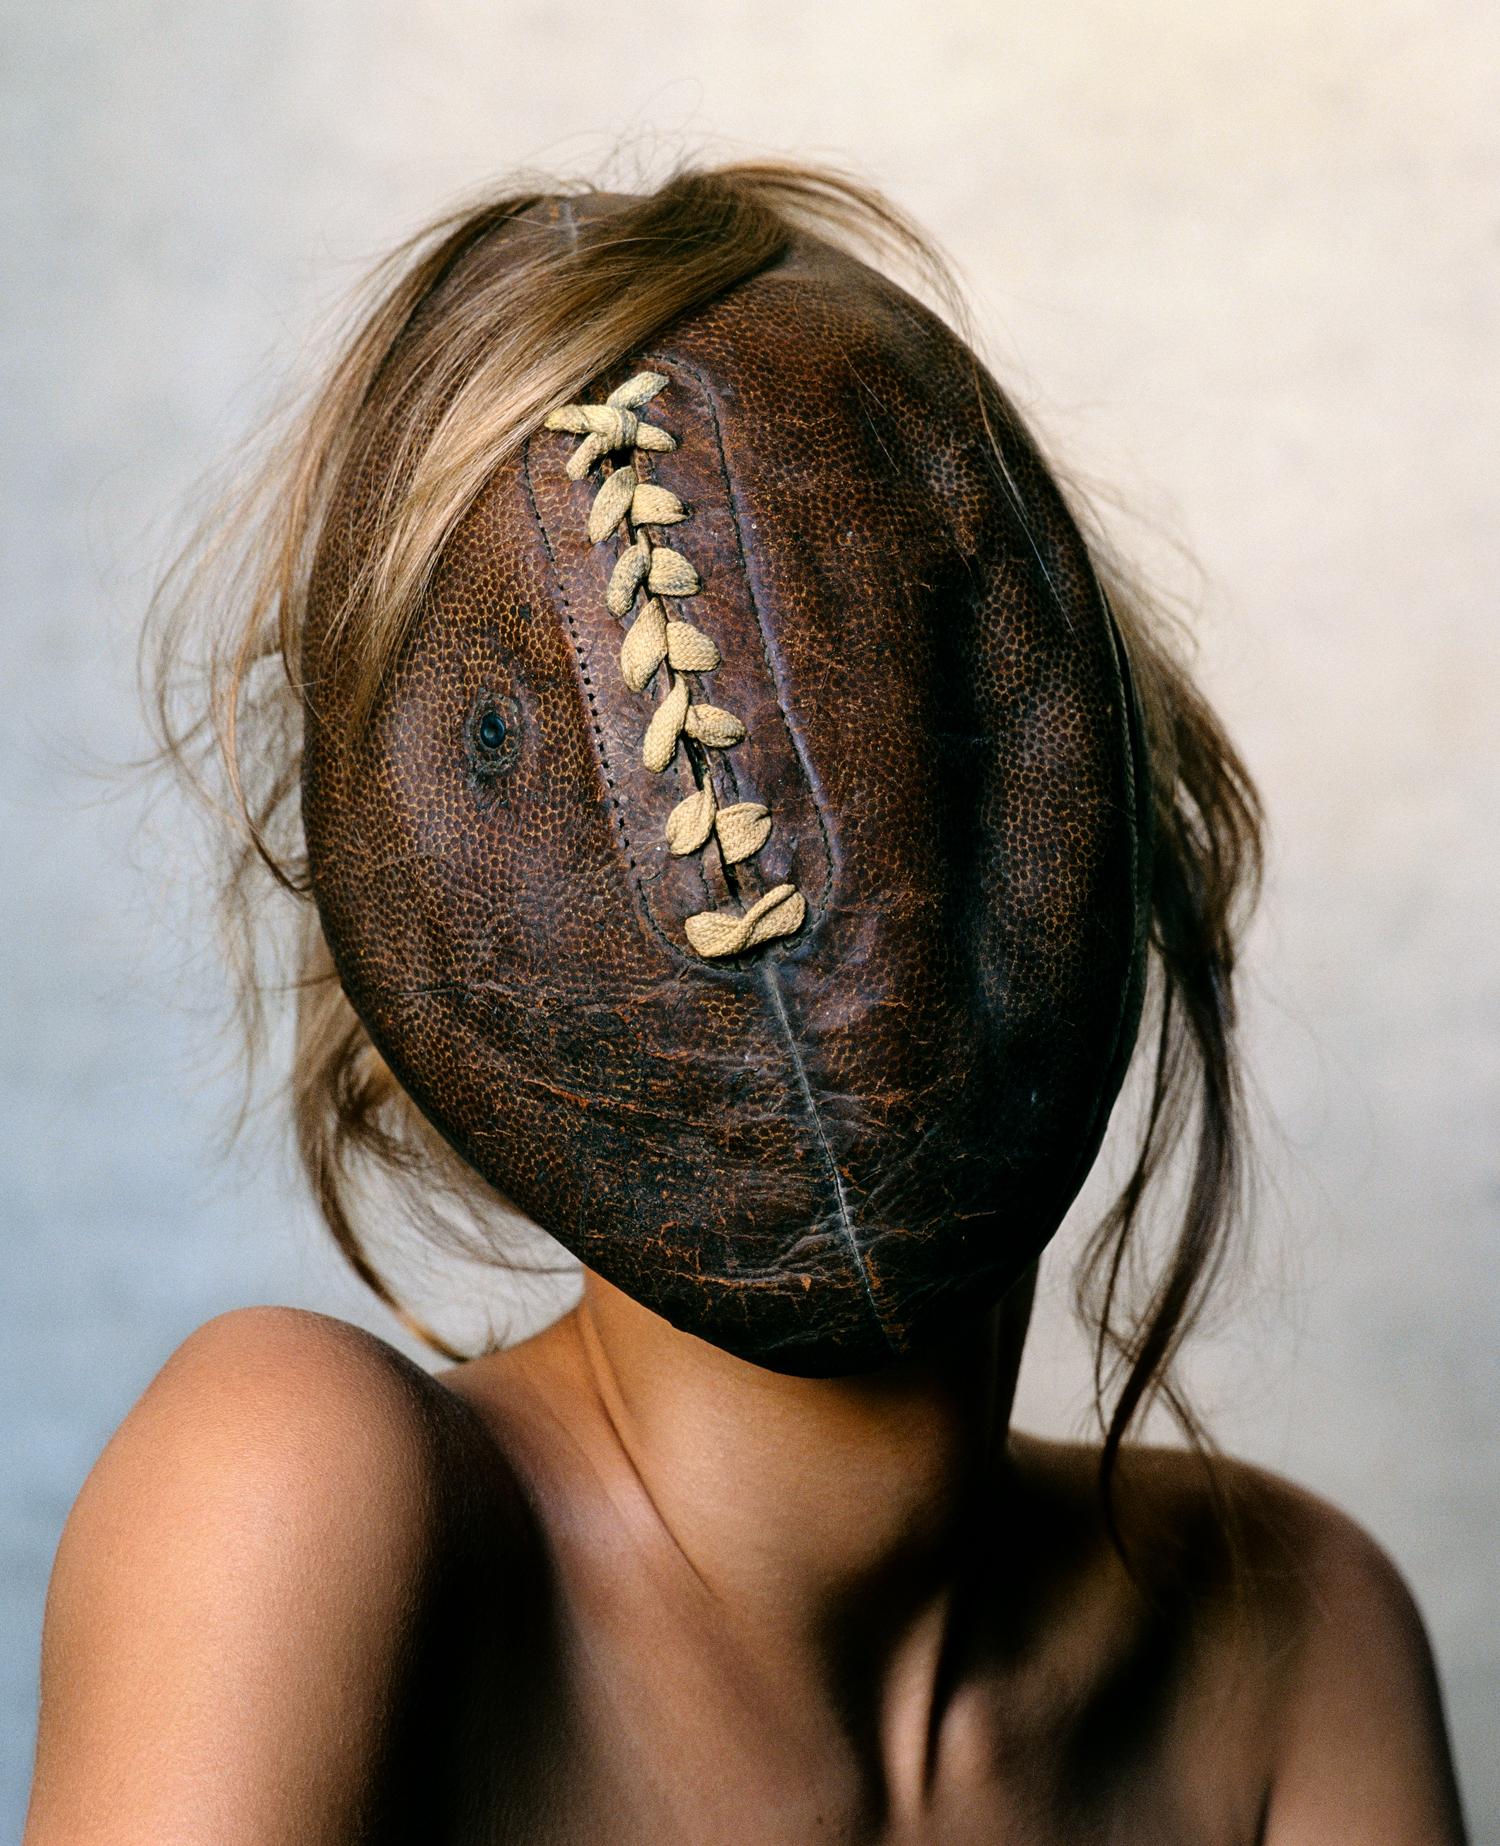 Football Face , New York, 2002 Chromogenic print © Condé Nast